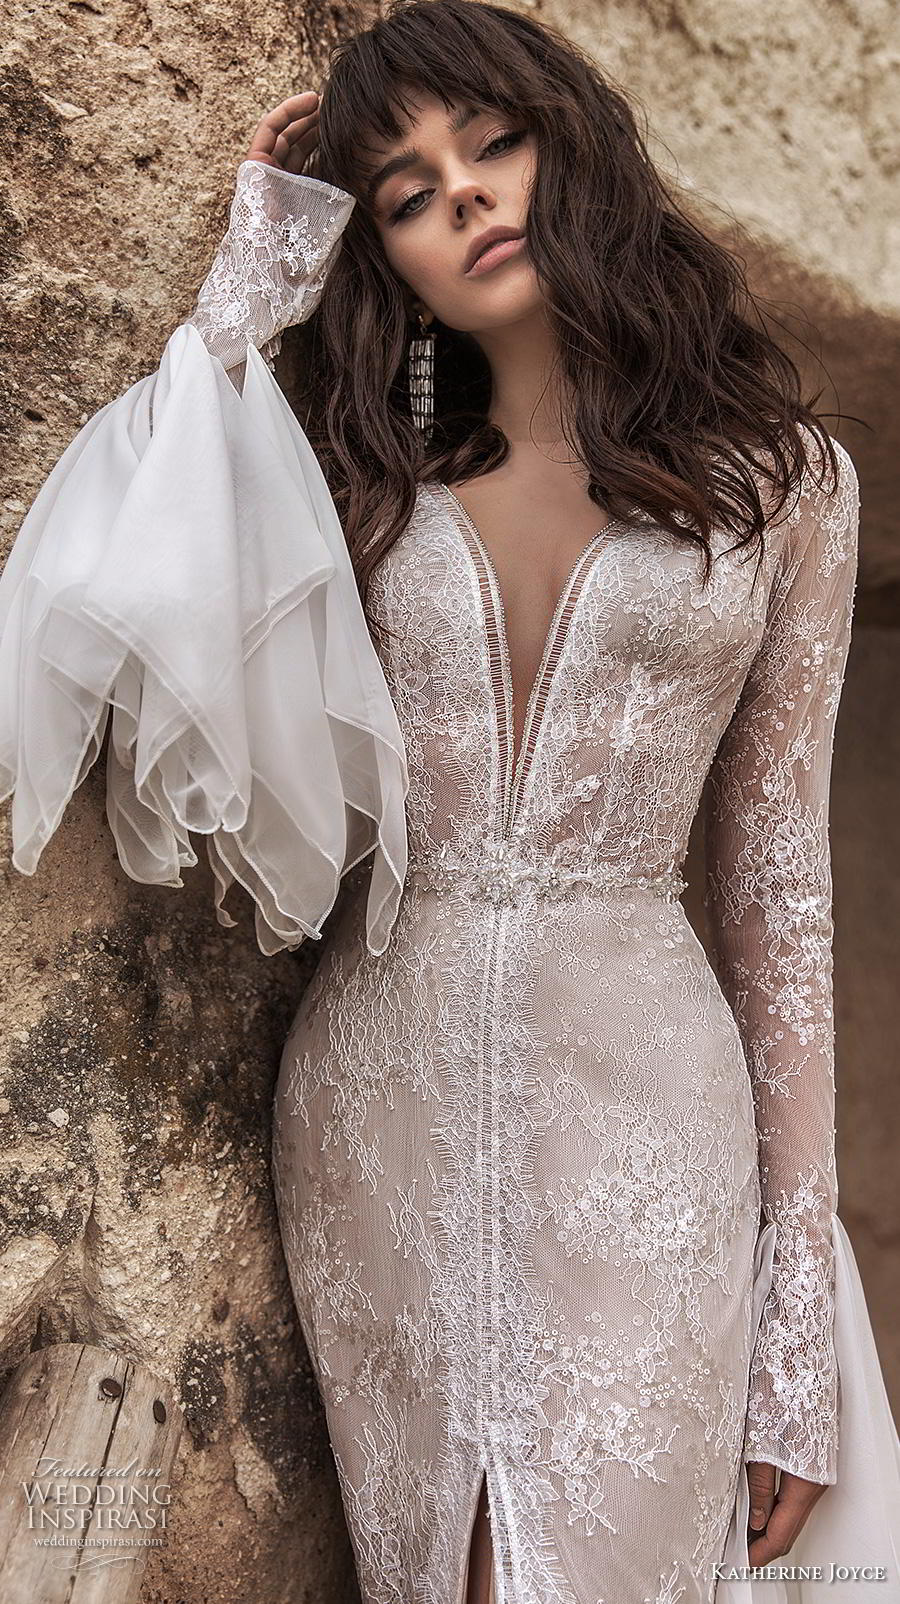 katherine joyce 2020 bridal long sleeves deep plunging v neck full embellishment slit skirt elegant sheath wedding dress v back sweep train (12) zv